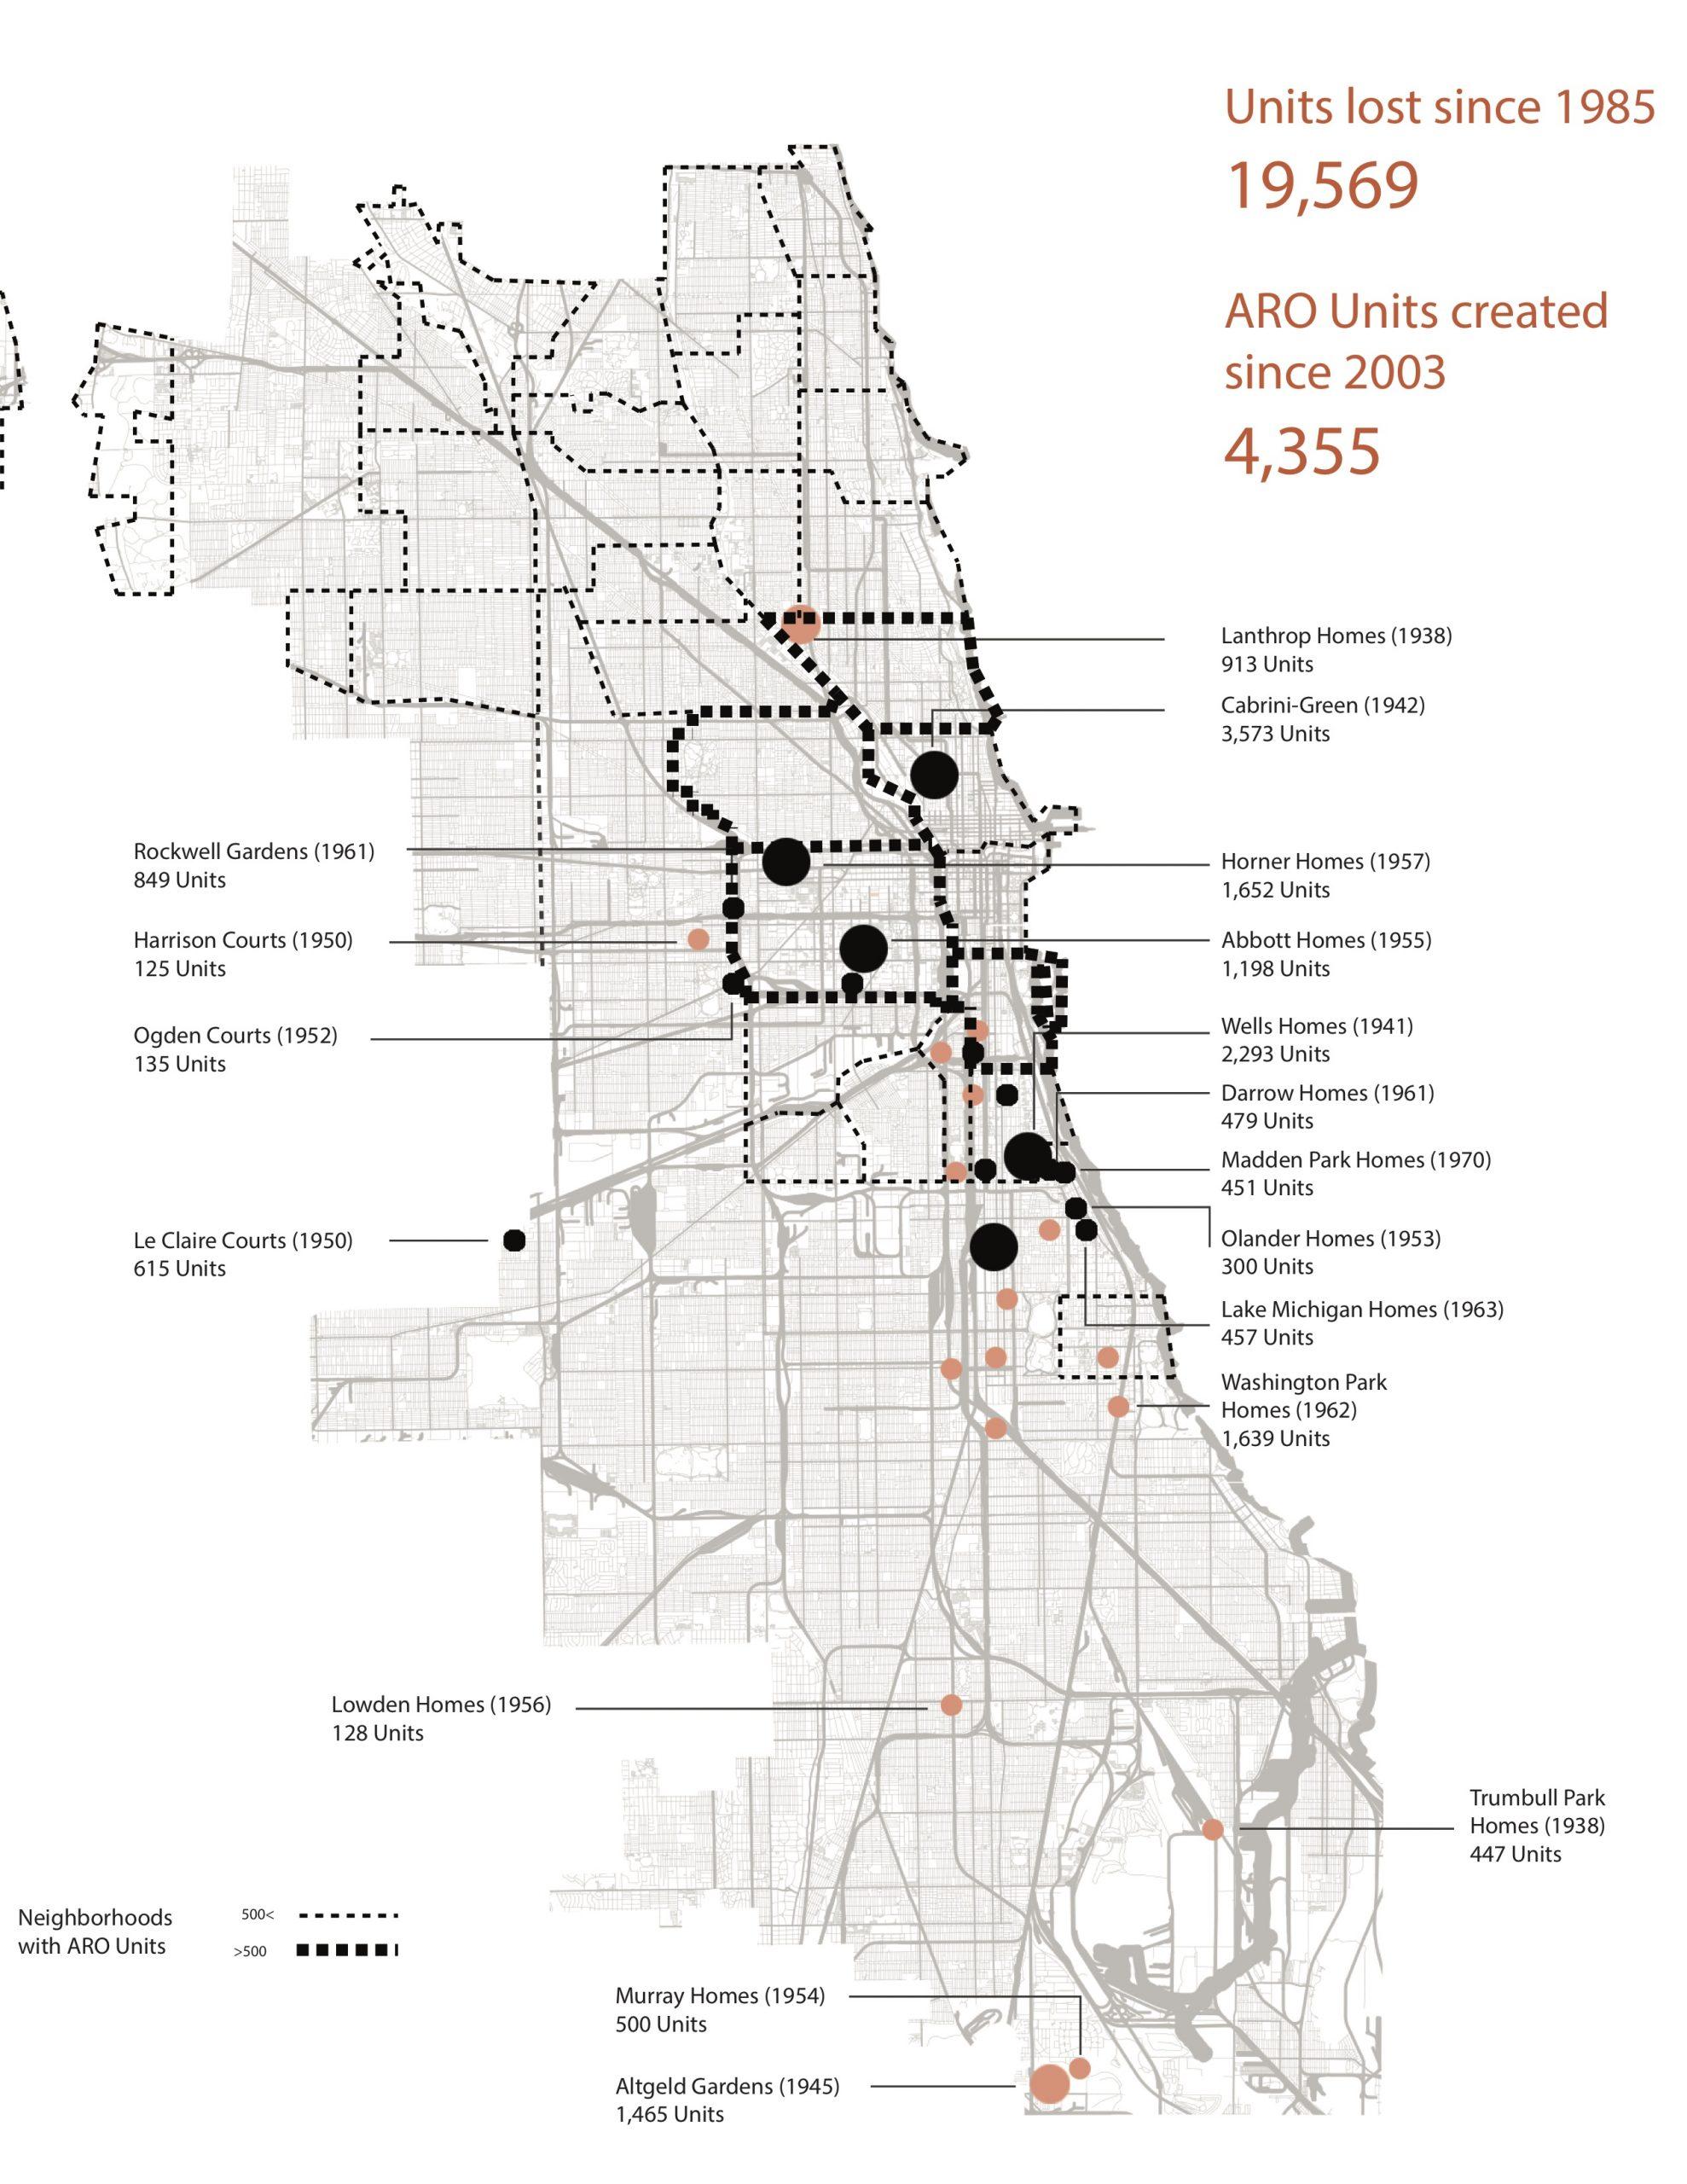 Amanda Fuson - Affordable Housing Units lost since 1985